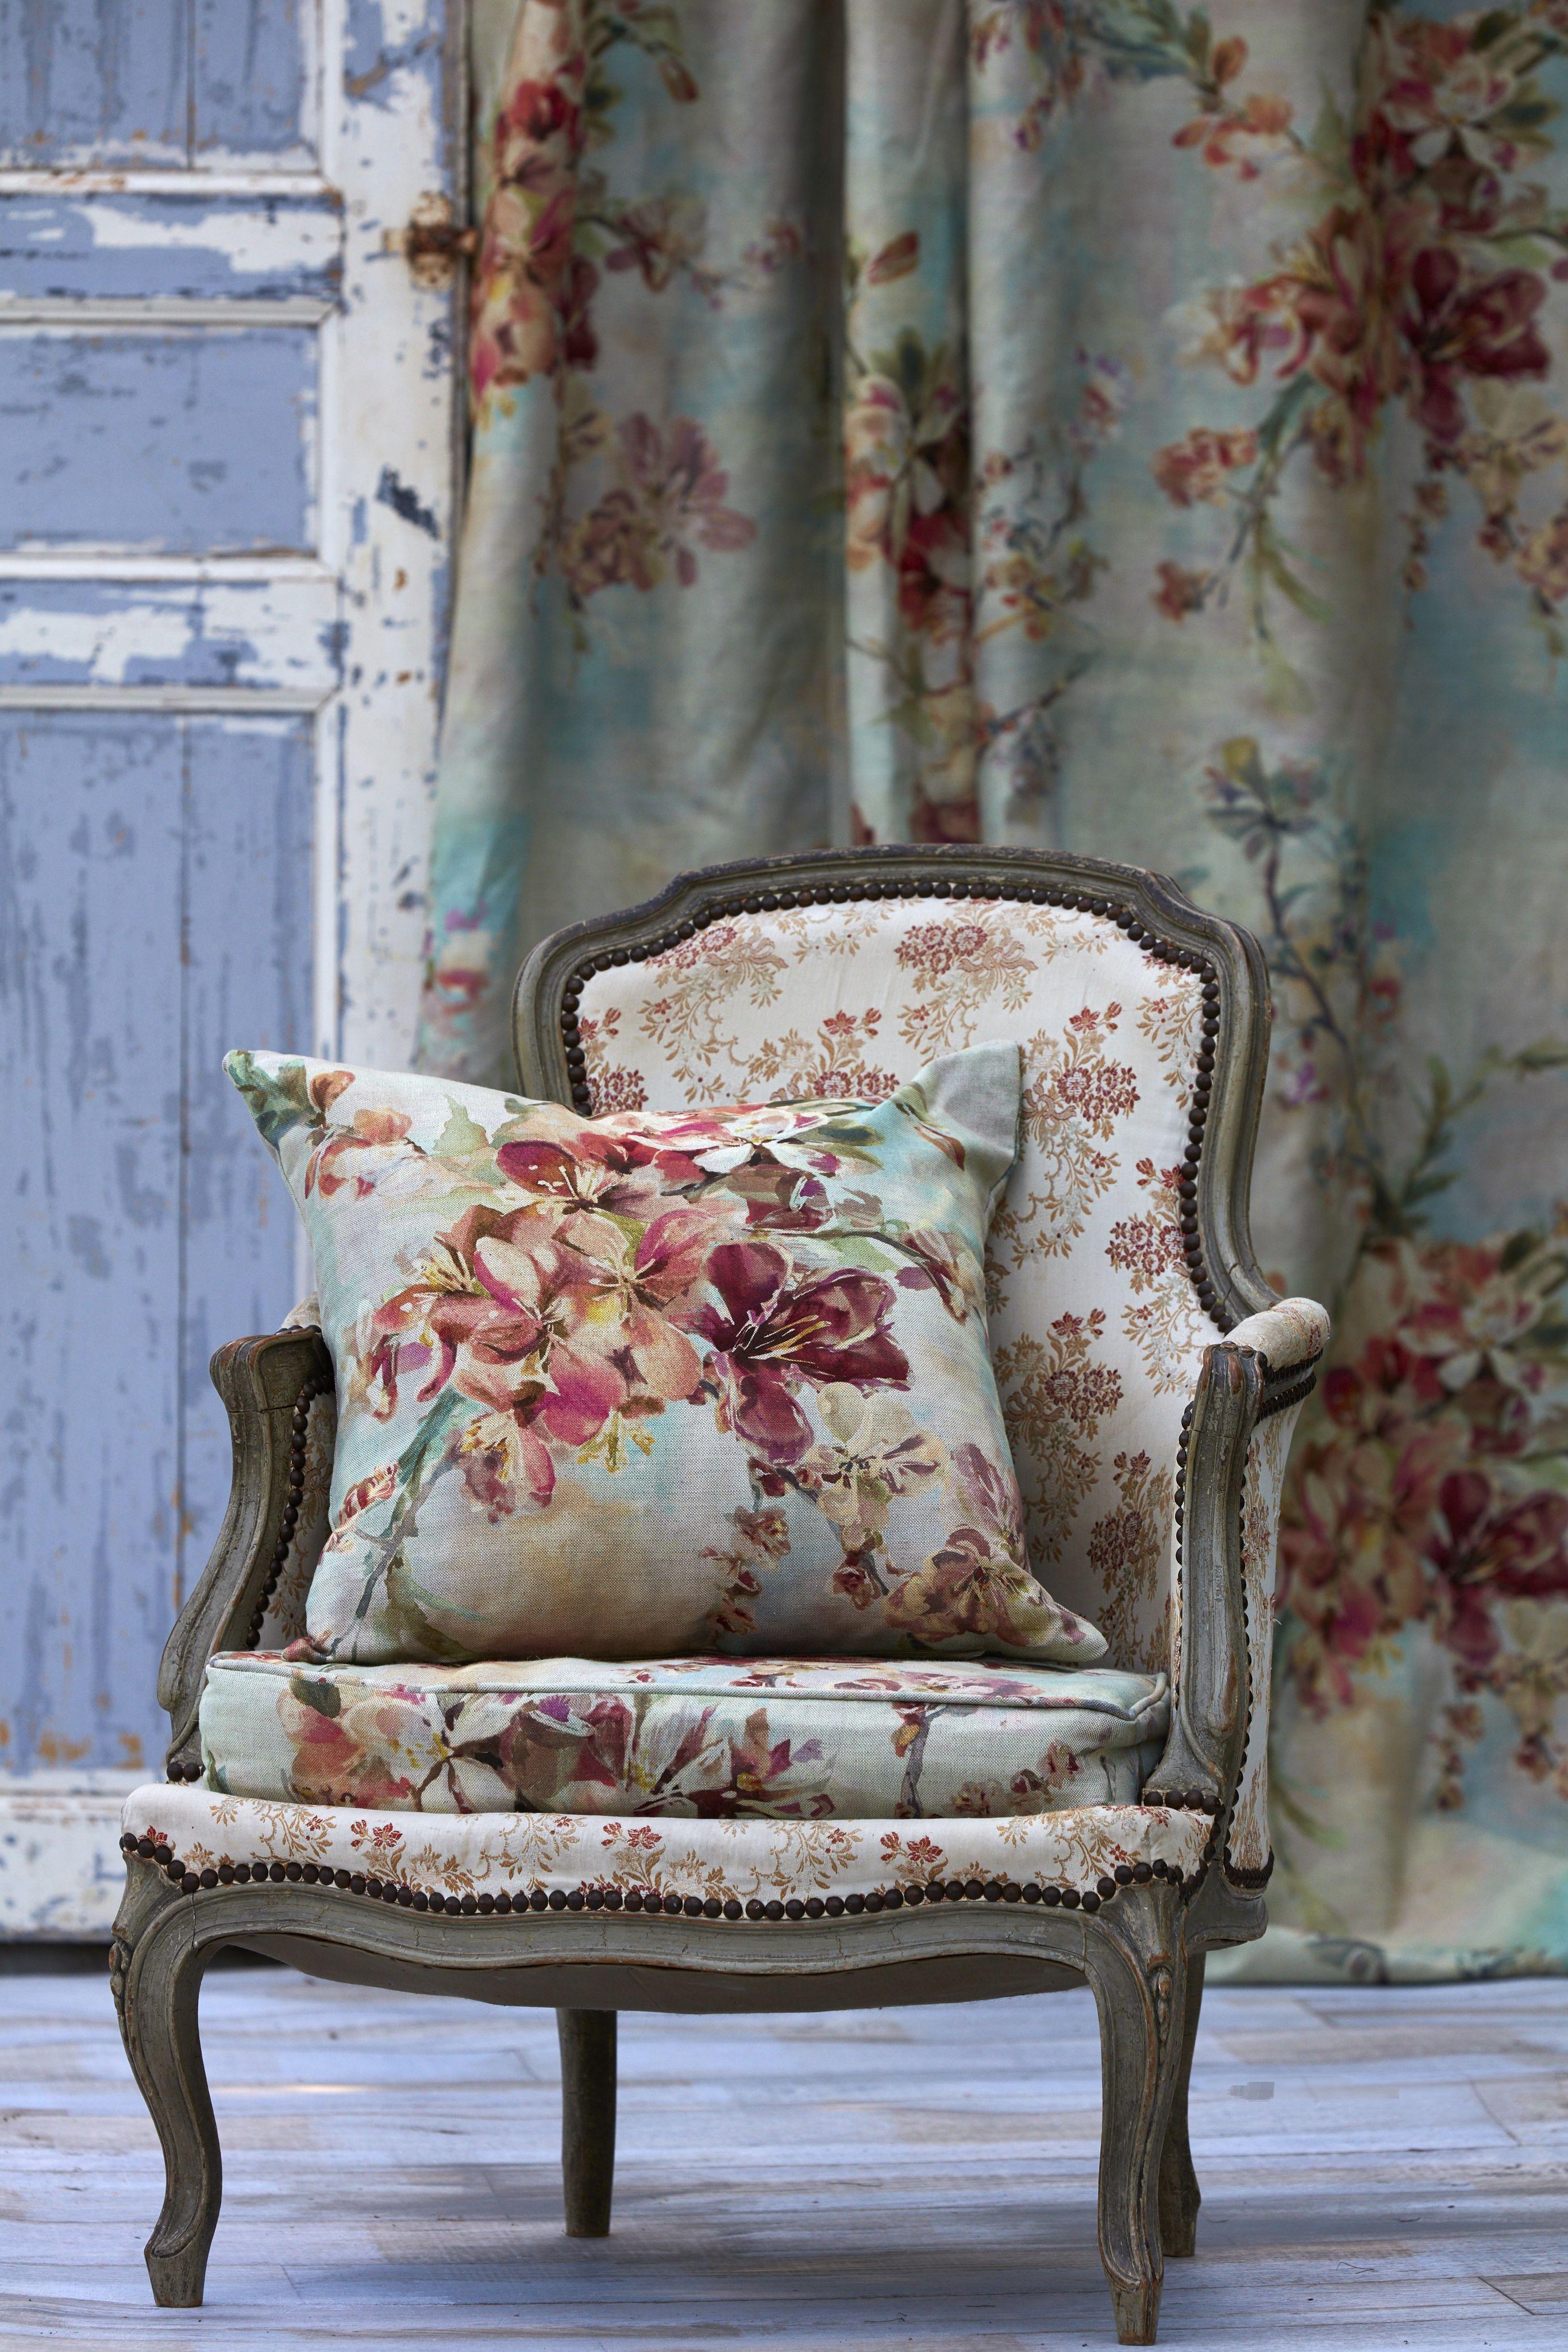 Megan Blossom Design By Boeme #floral #fabric #chair #flowers #pretty #